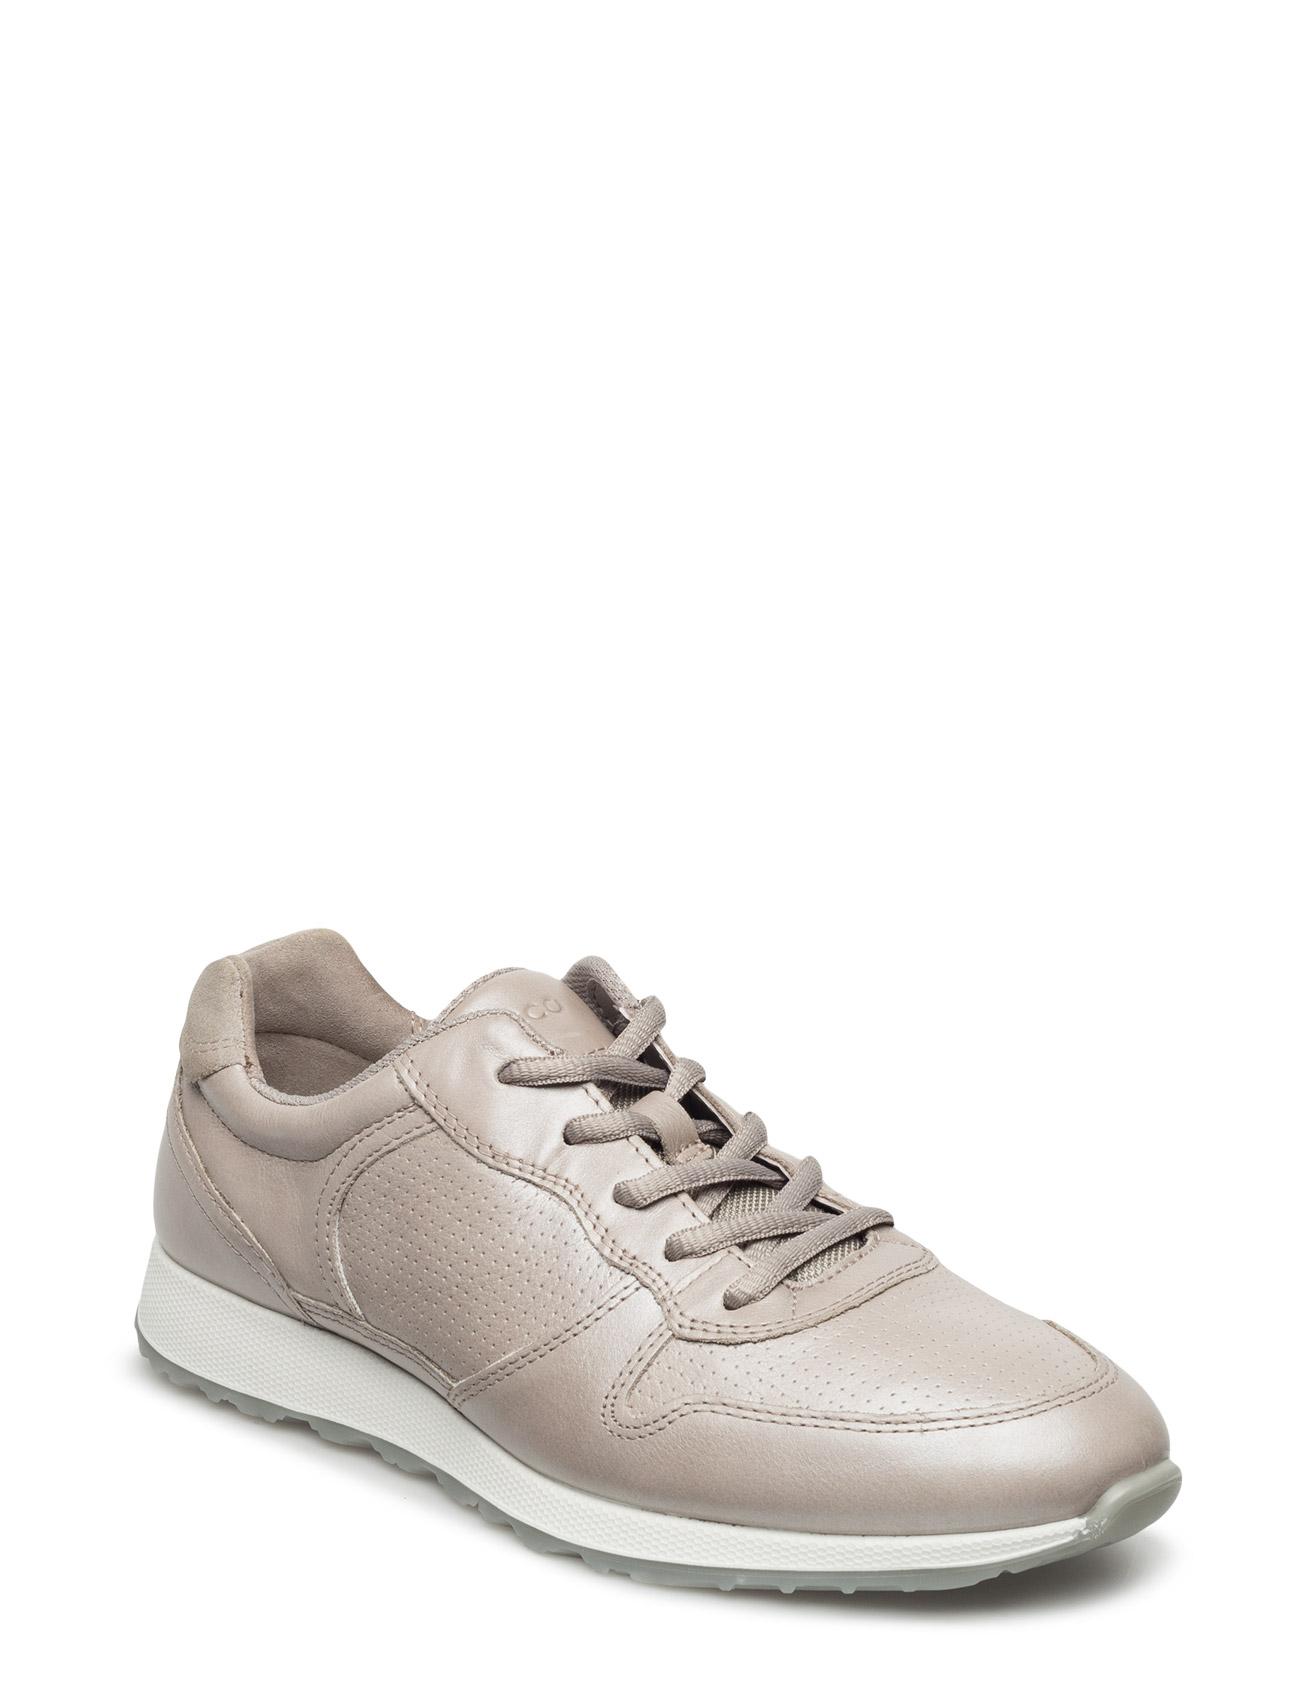 Sneak Ladies ECCO Sneakers til Damer i